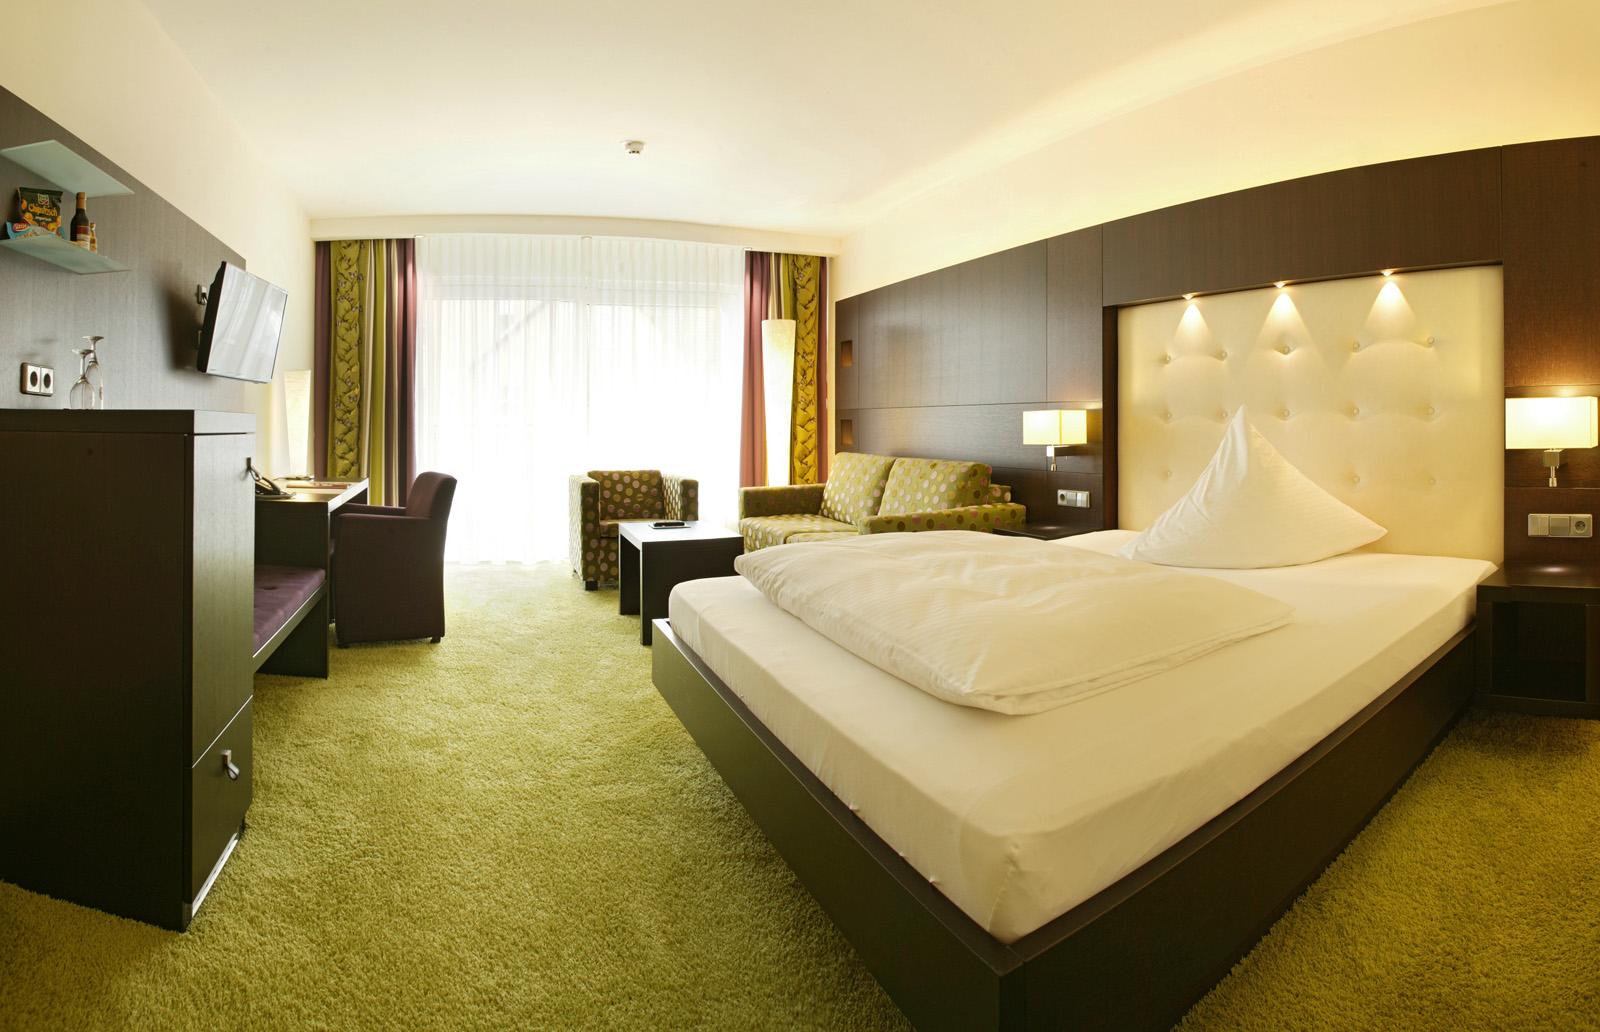 Suite - Hotel Sonne, Rudersberg/schlechtbach